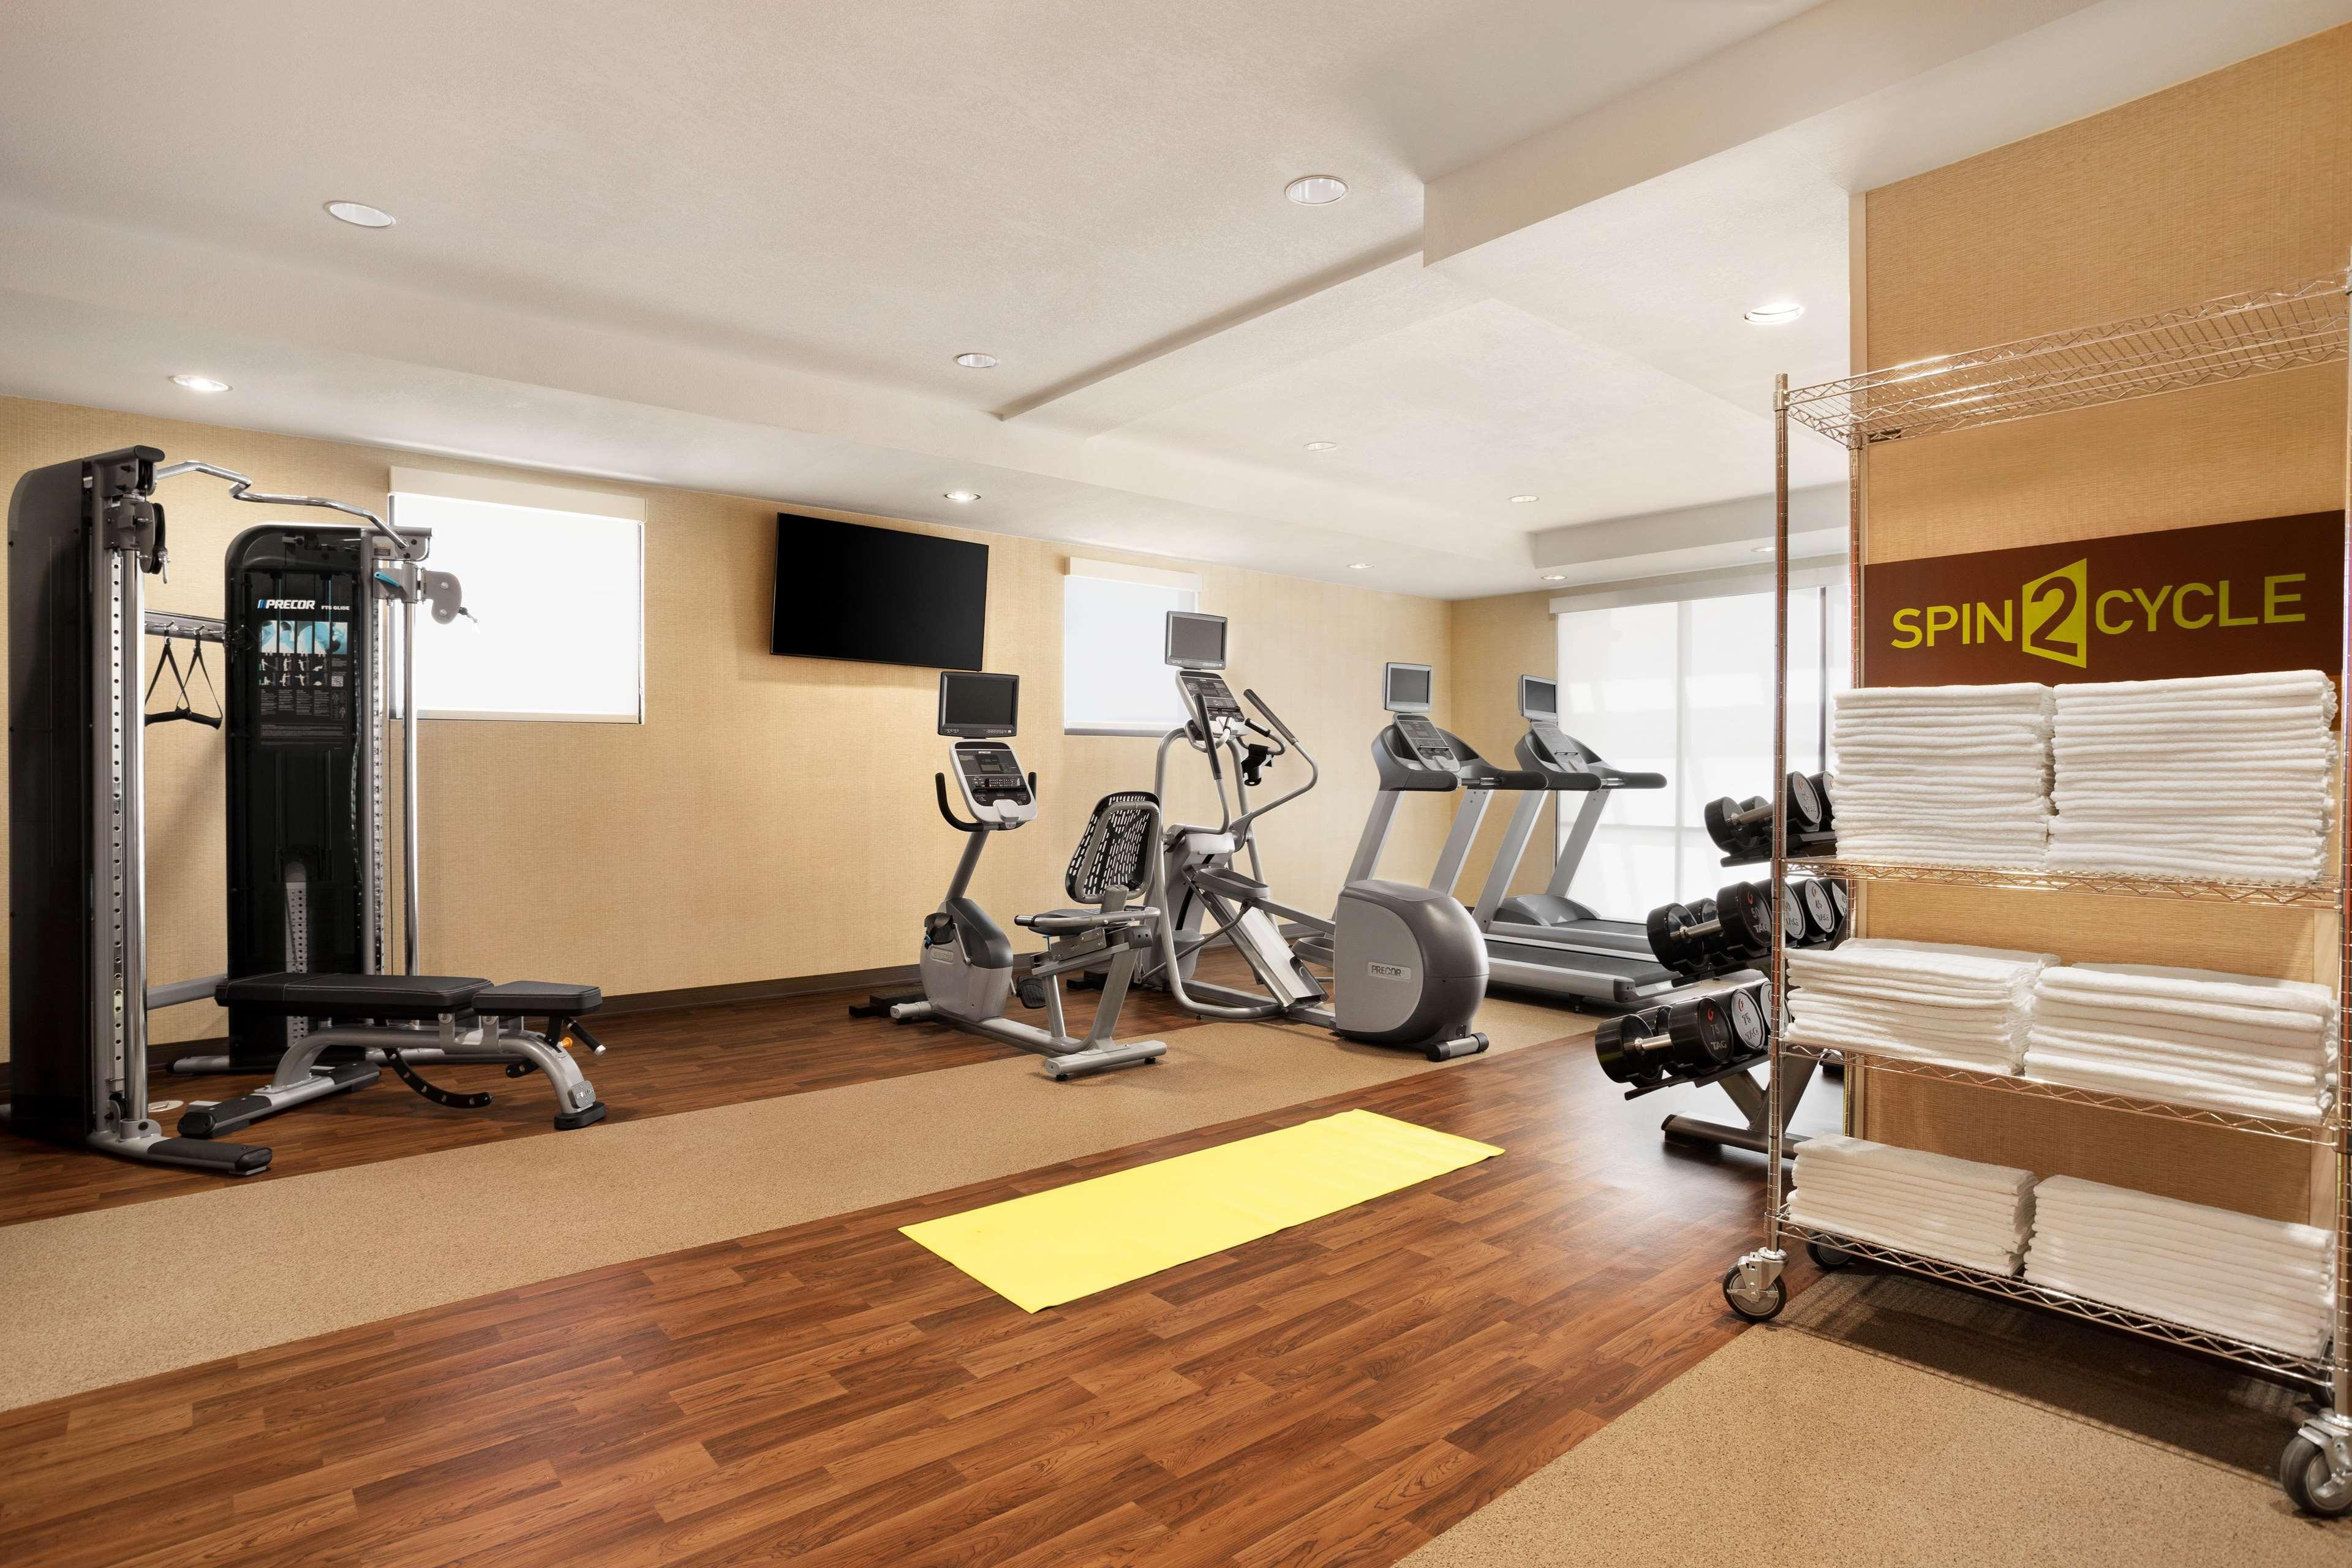 Home2 Suites by Hilton Elko image 14